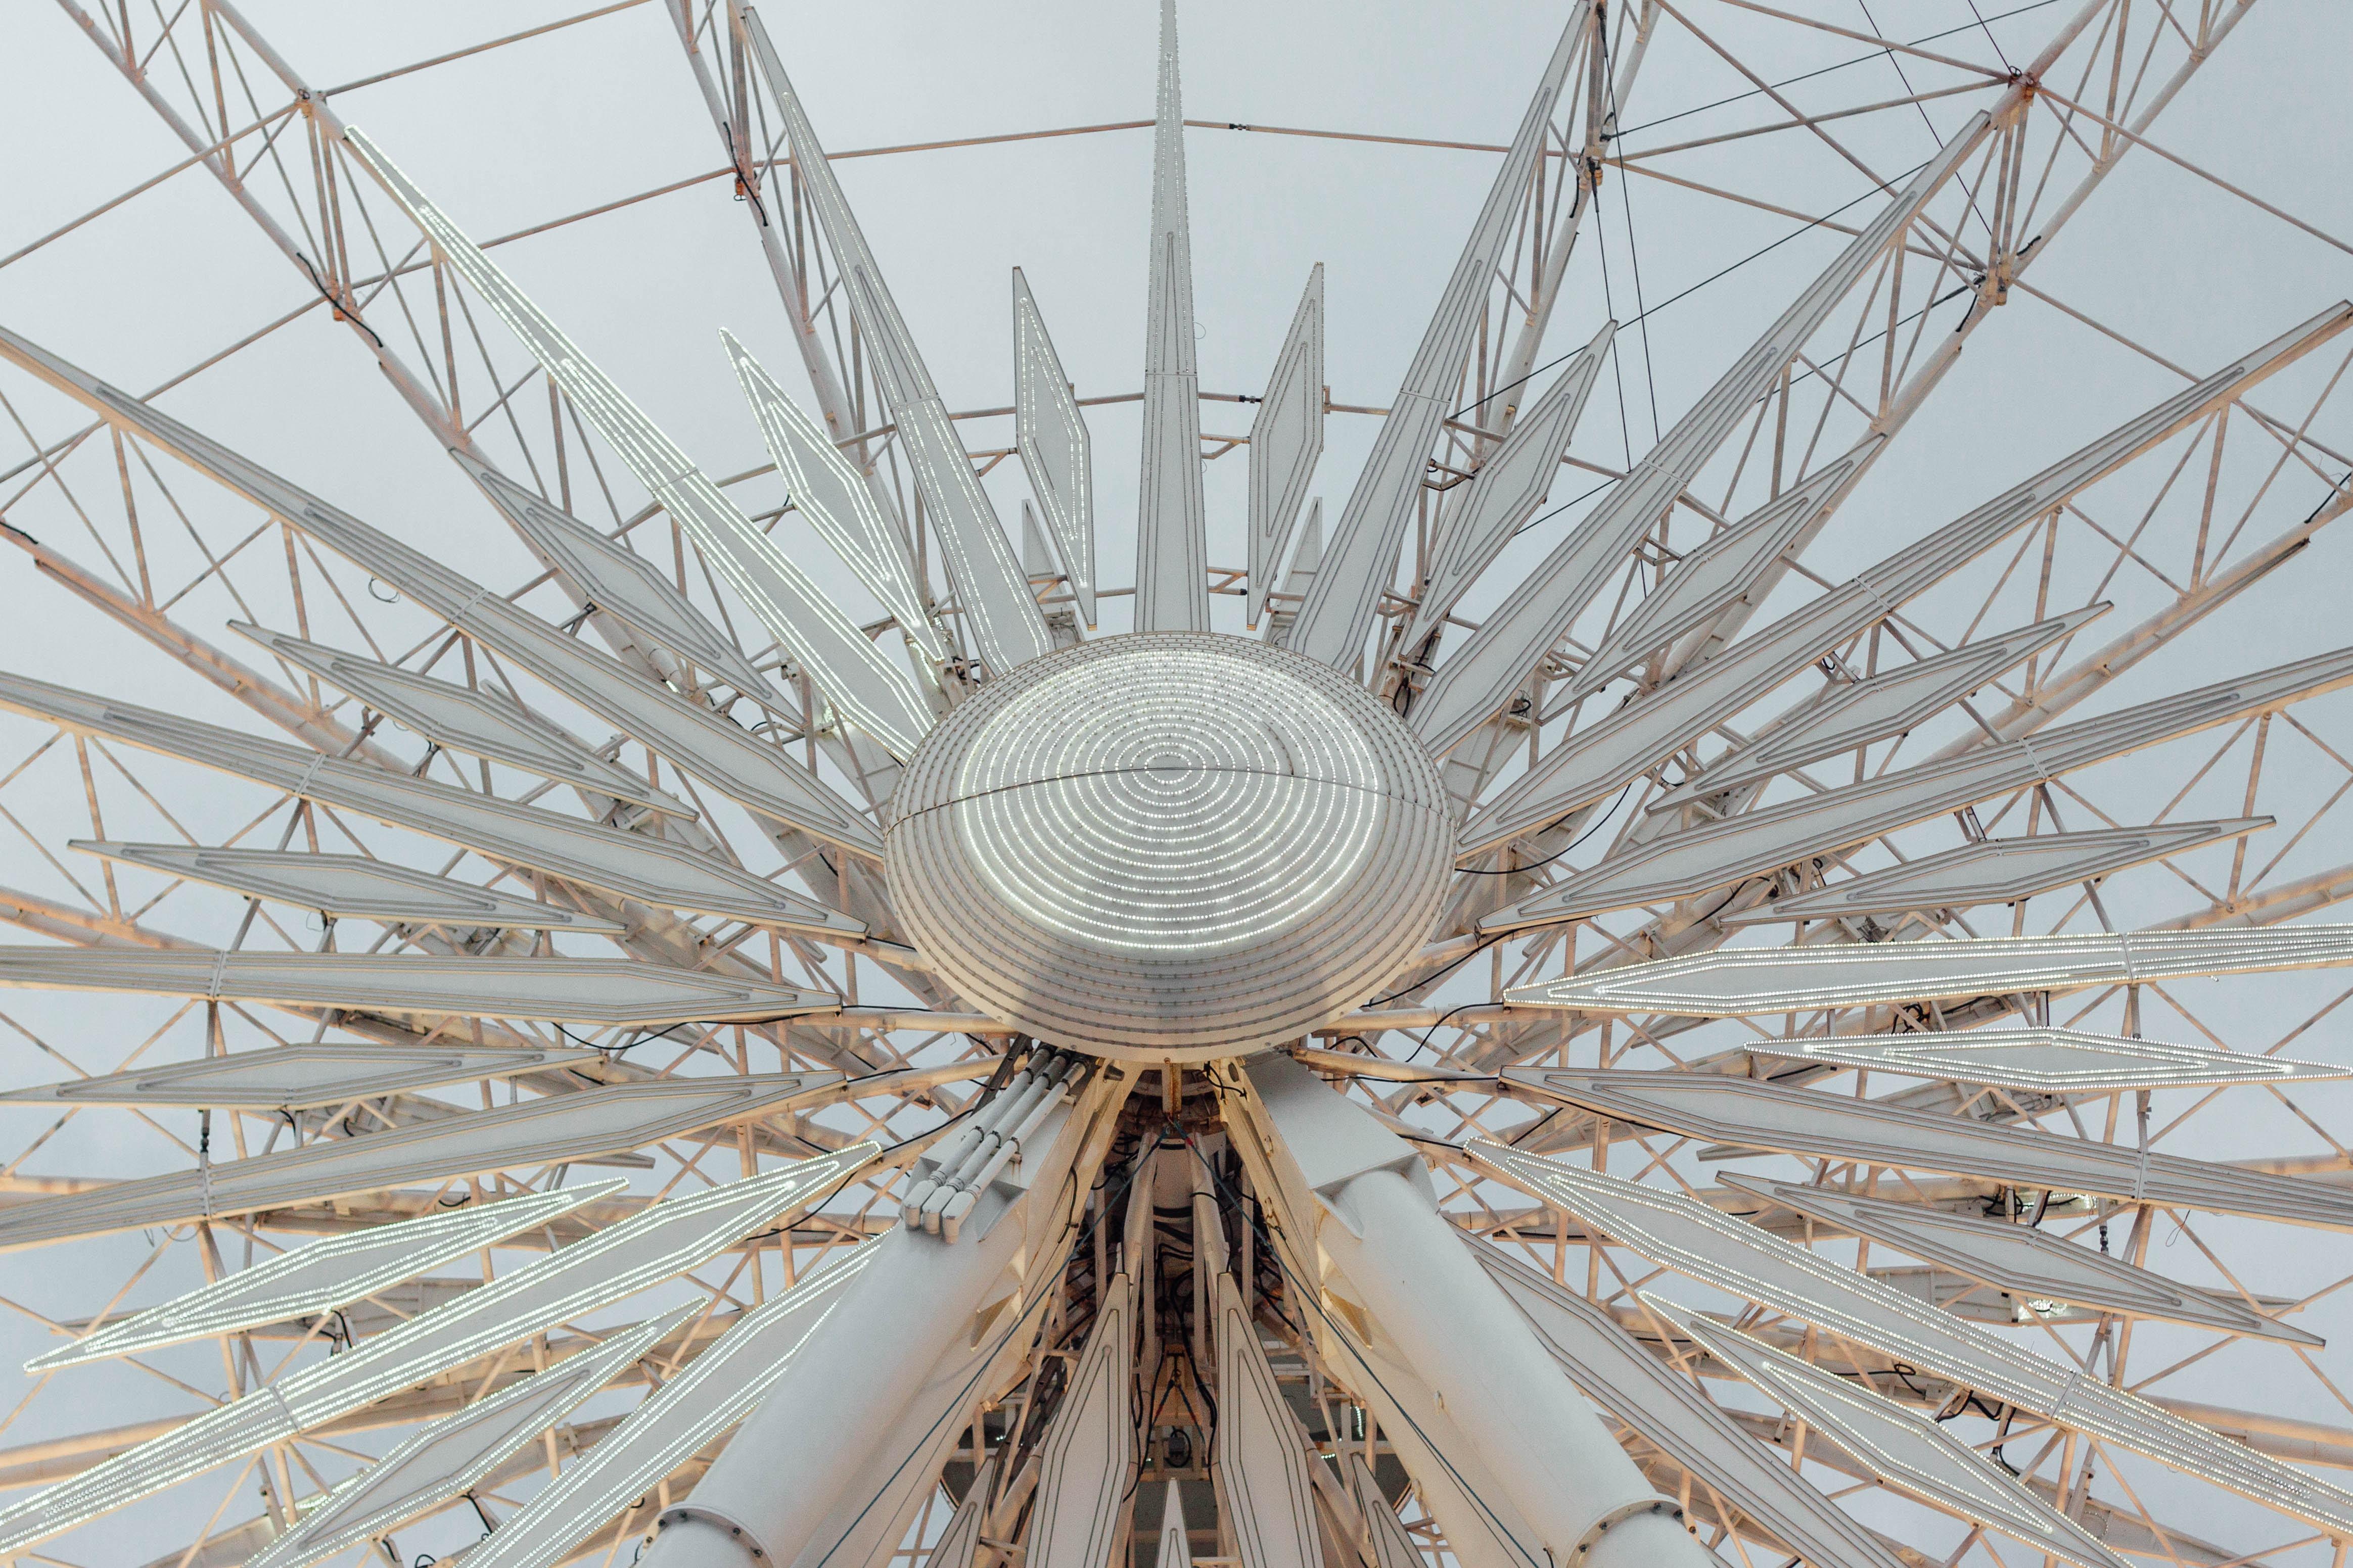 photo of gray Ferris wheel